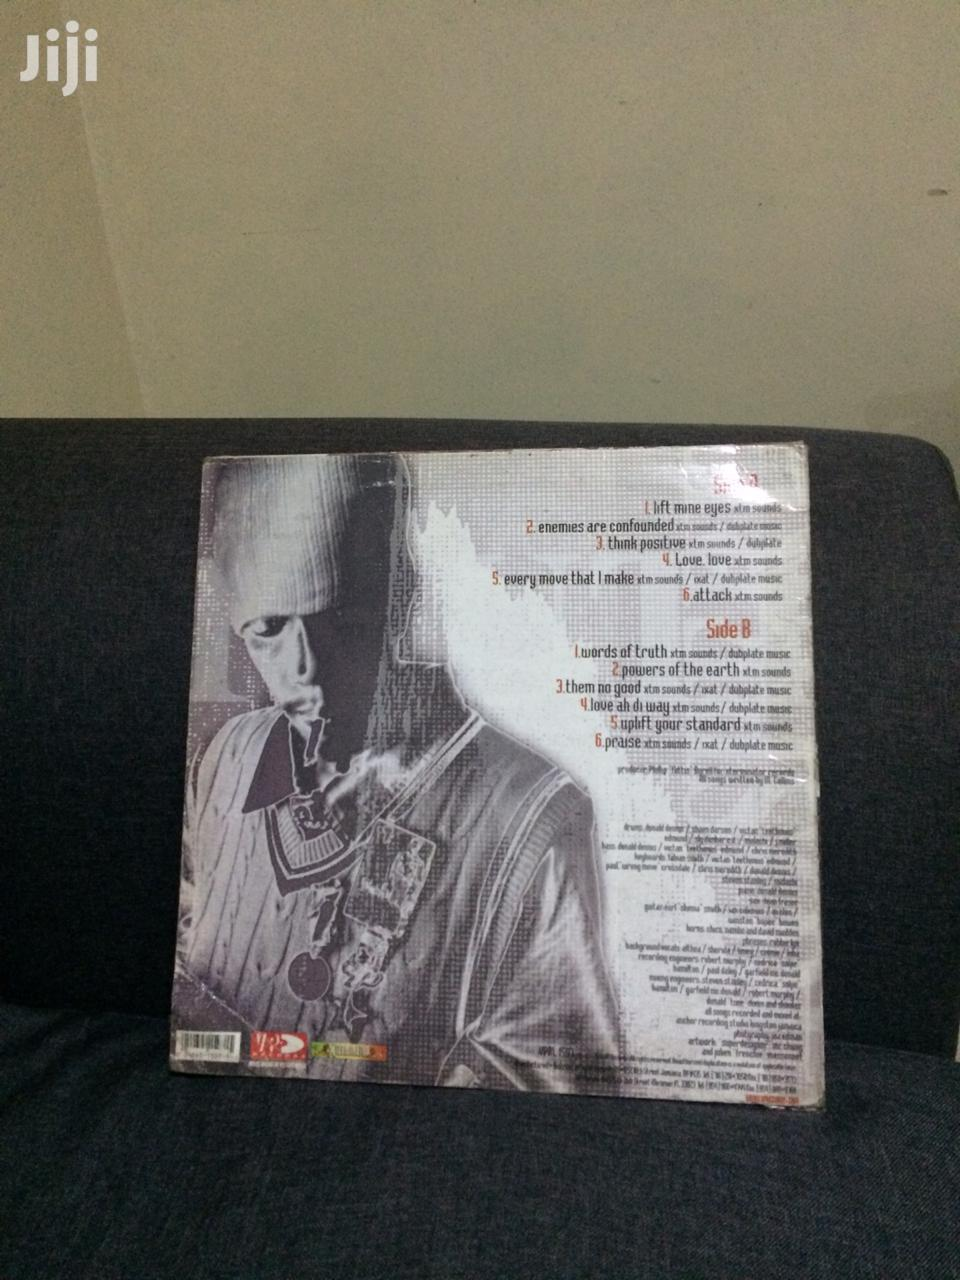 Vinyl Records Albums | CDs & DVDs for sale in Nairobi Central, Nairobi, Kenya